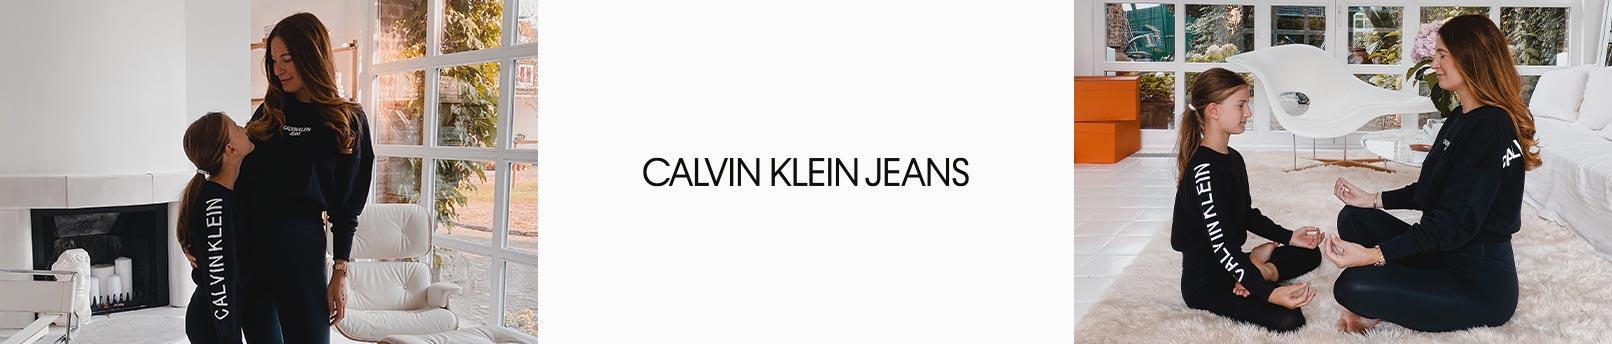 Scopri Calvin Klein Jeans